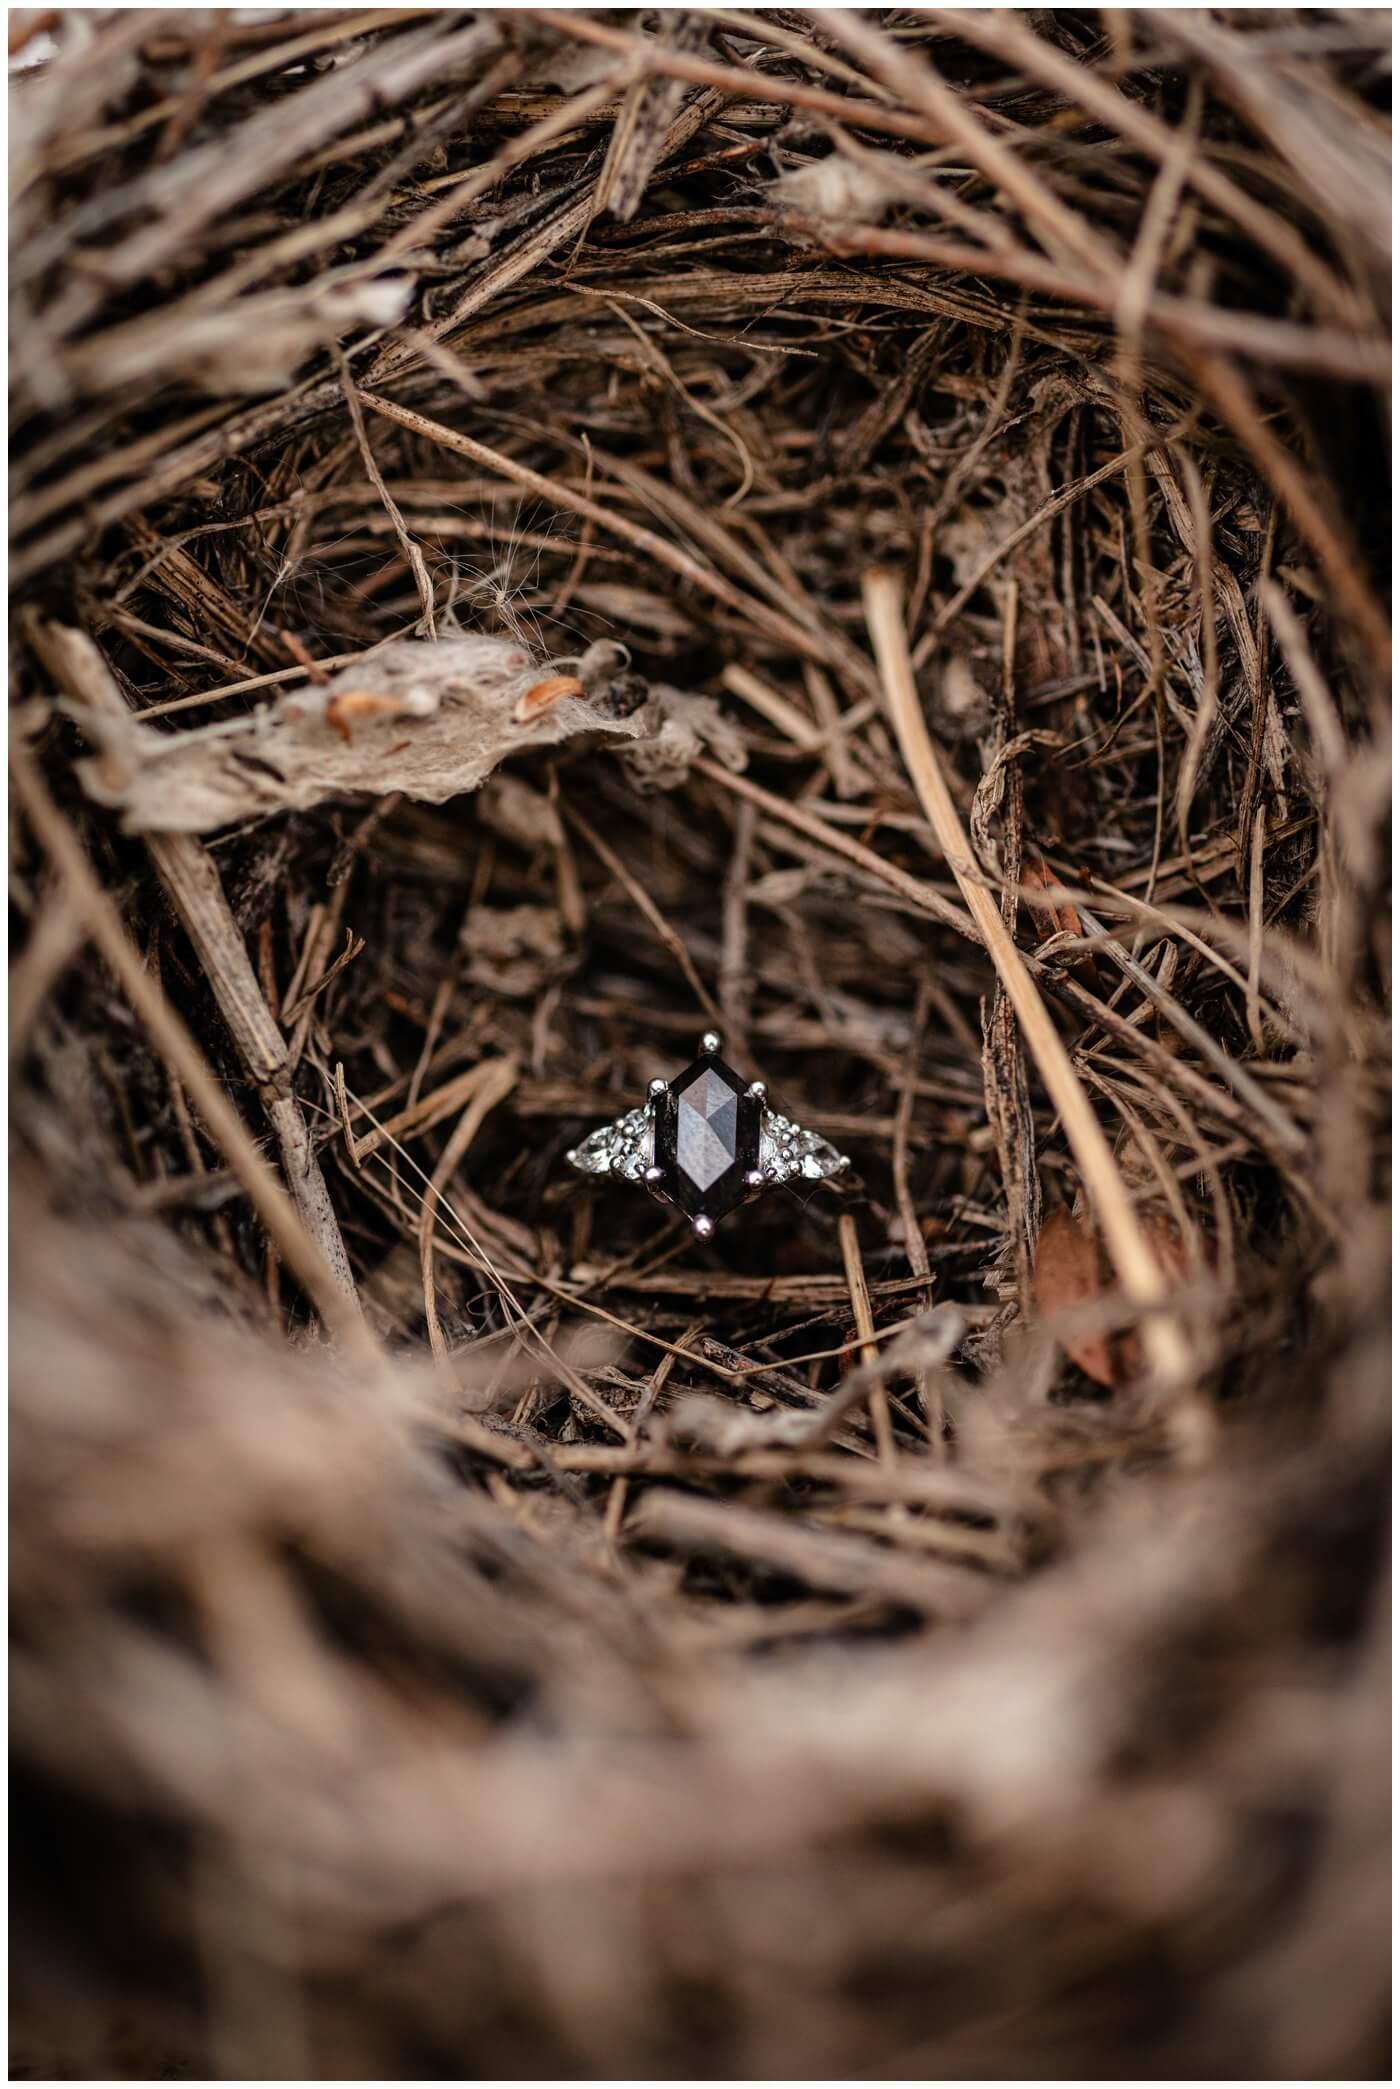 Regina Engagement Photography - Stephen & Sarah - 005 - Birds Nest Engagement Ring